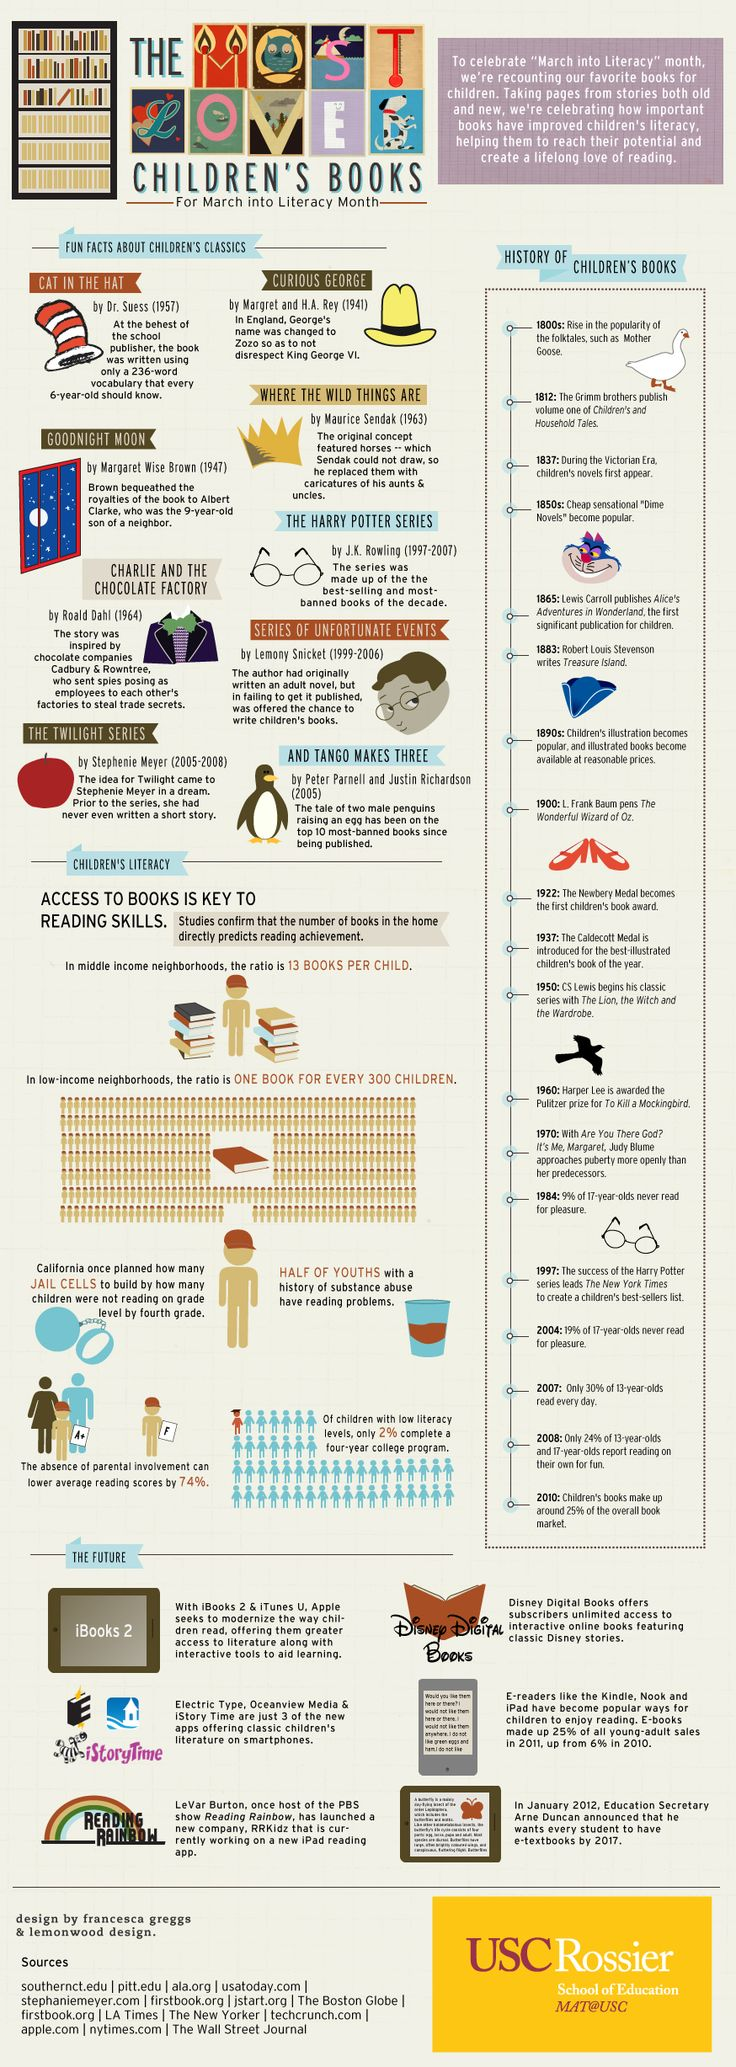 Most Loved Children's Books - MAT@USC through Infographics